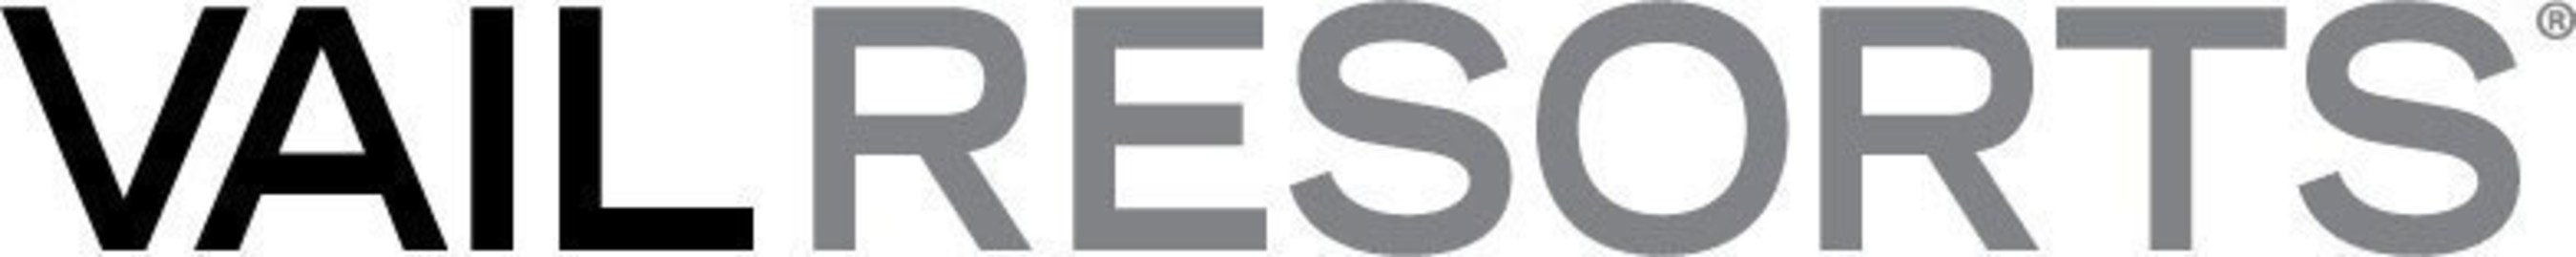 Vail Resorts, Inc. logo